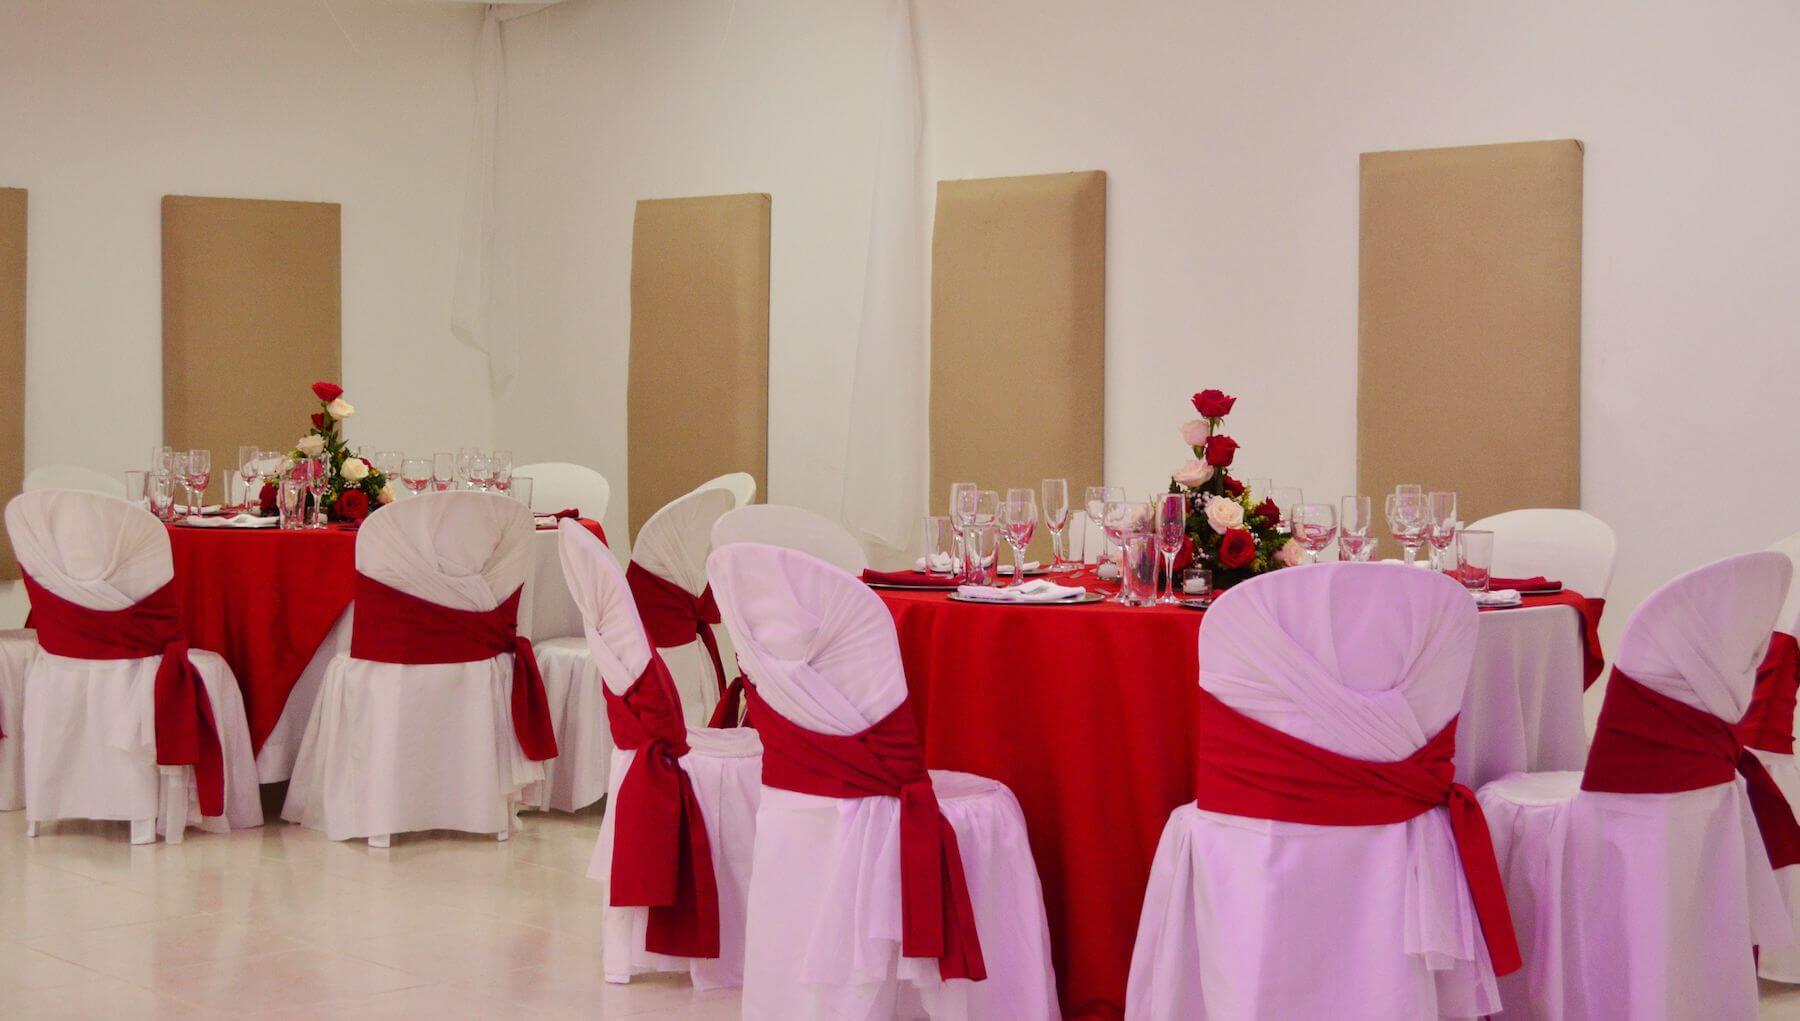 evento-banquete7